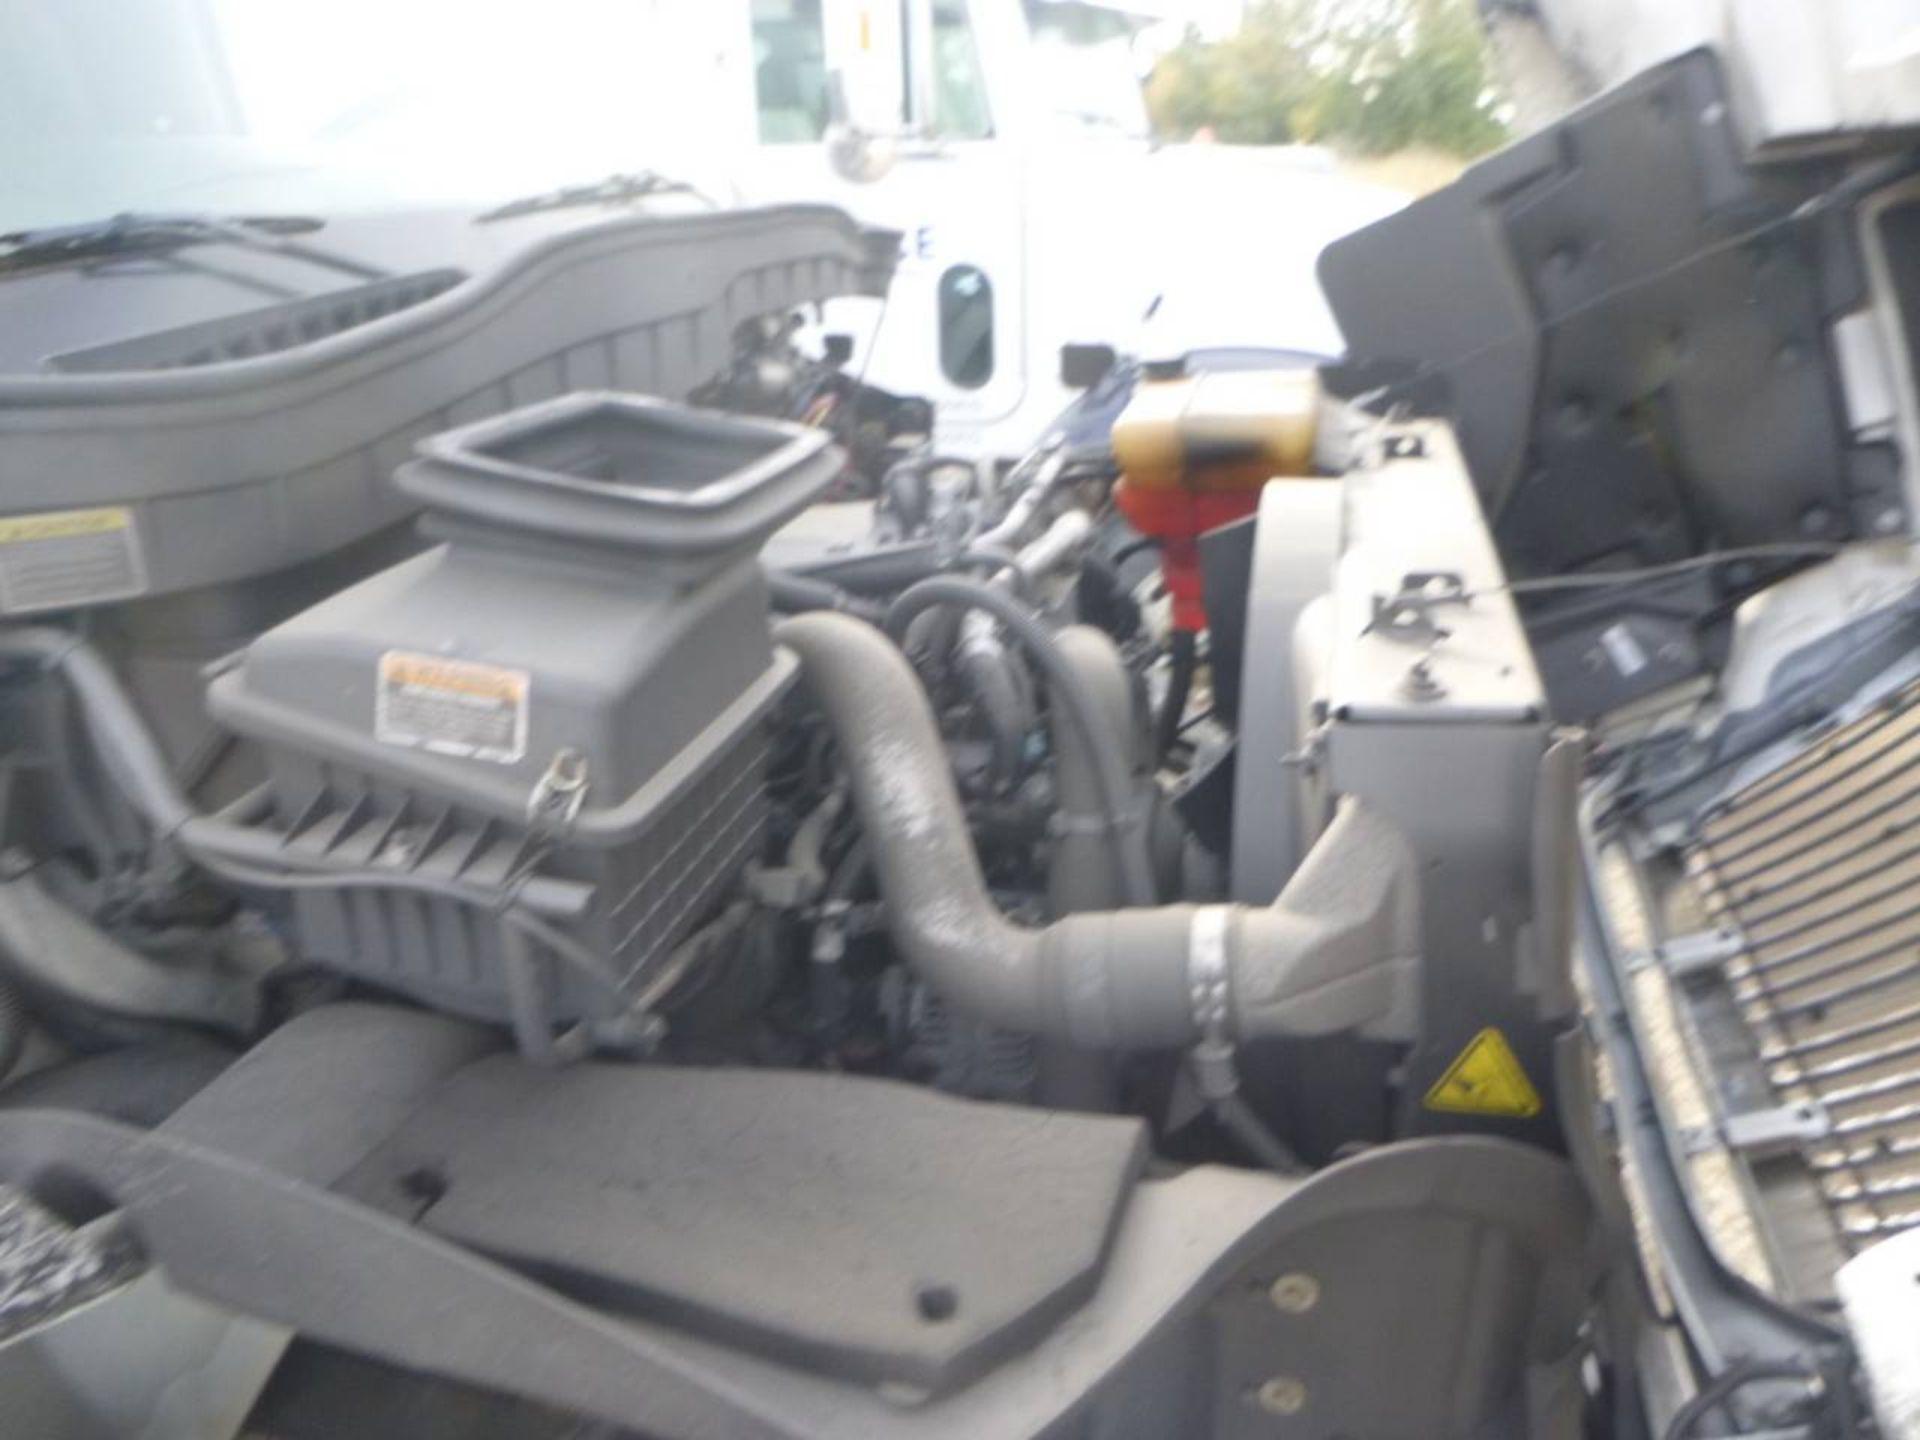 2018 International 4400 SBA 6X4 Dump Truck - Image 11 of 15